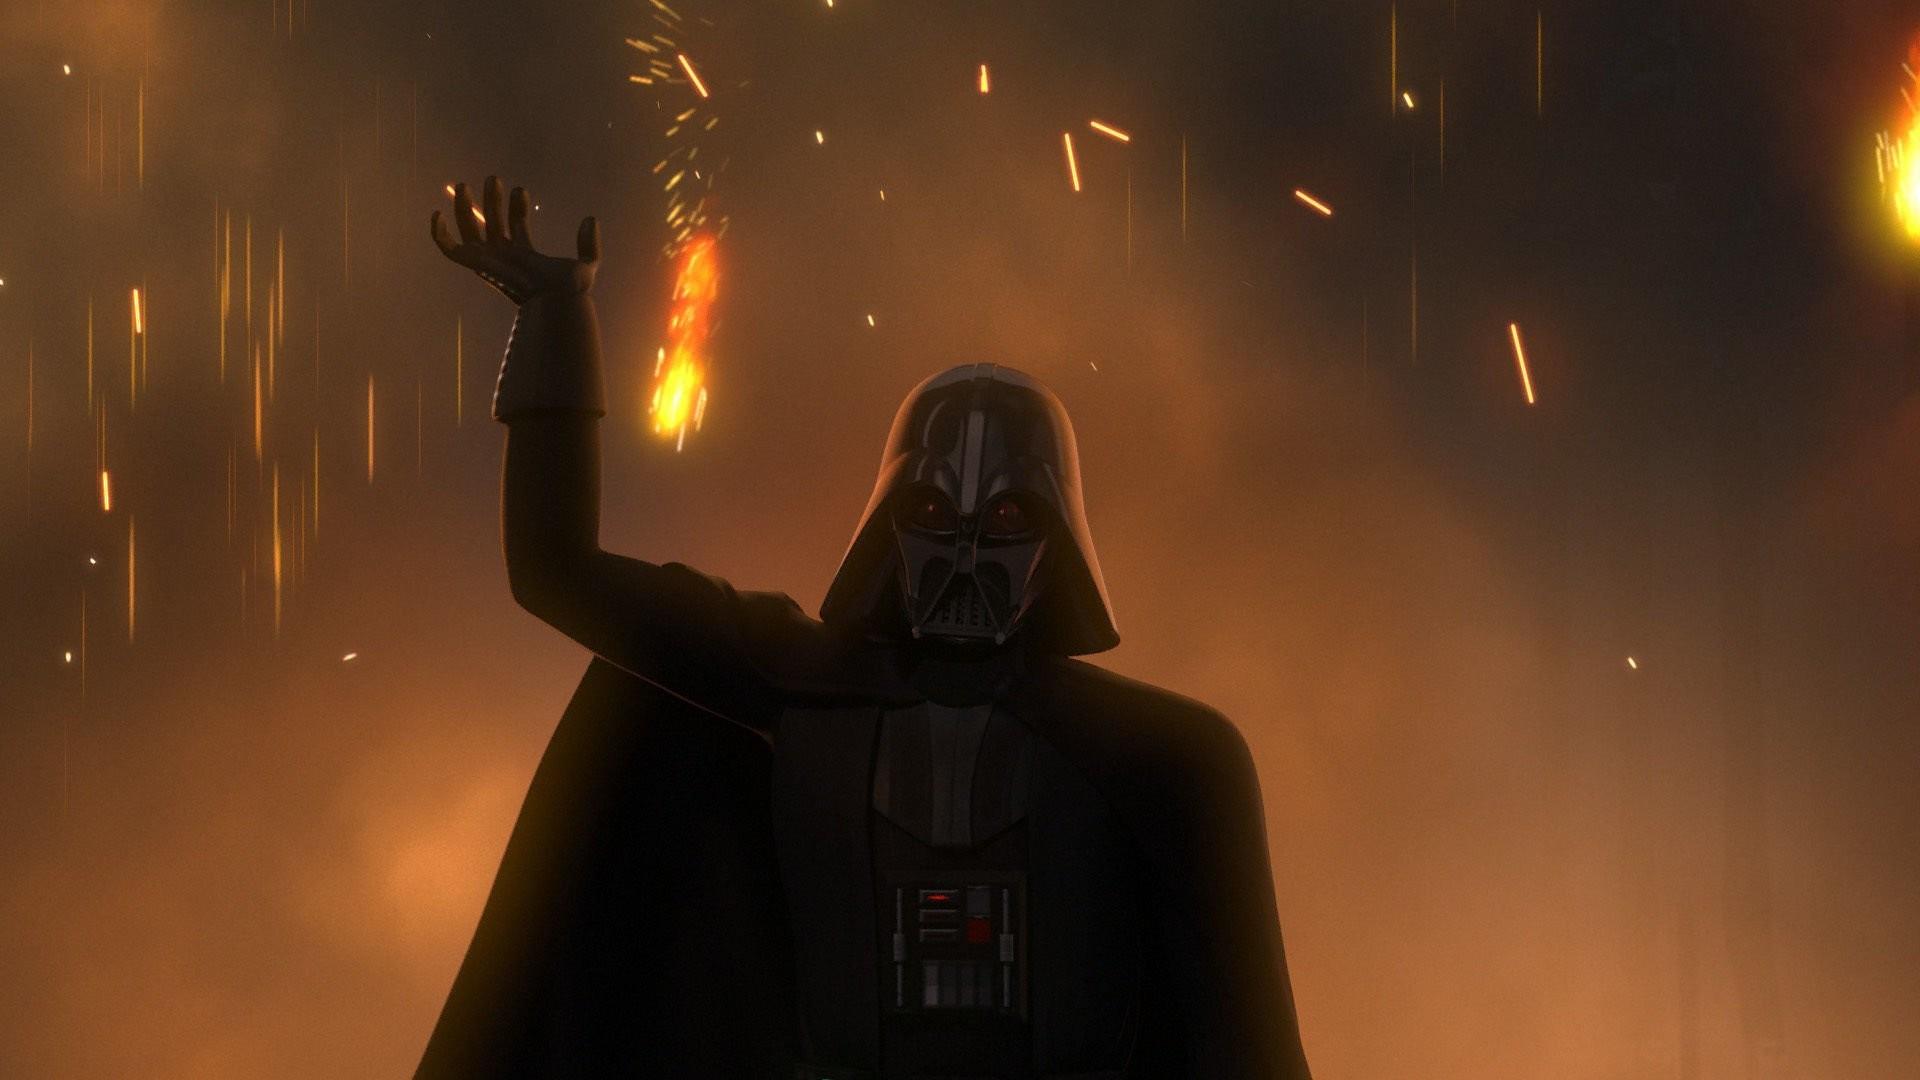 TV Show – Star Wars Rebels Darth Vader Wallpaper